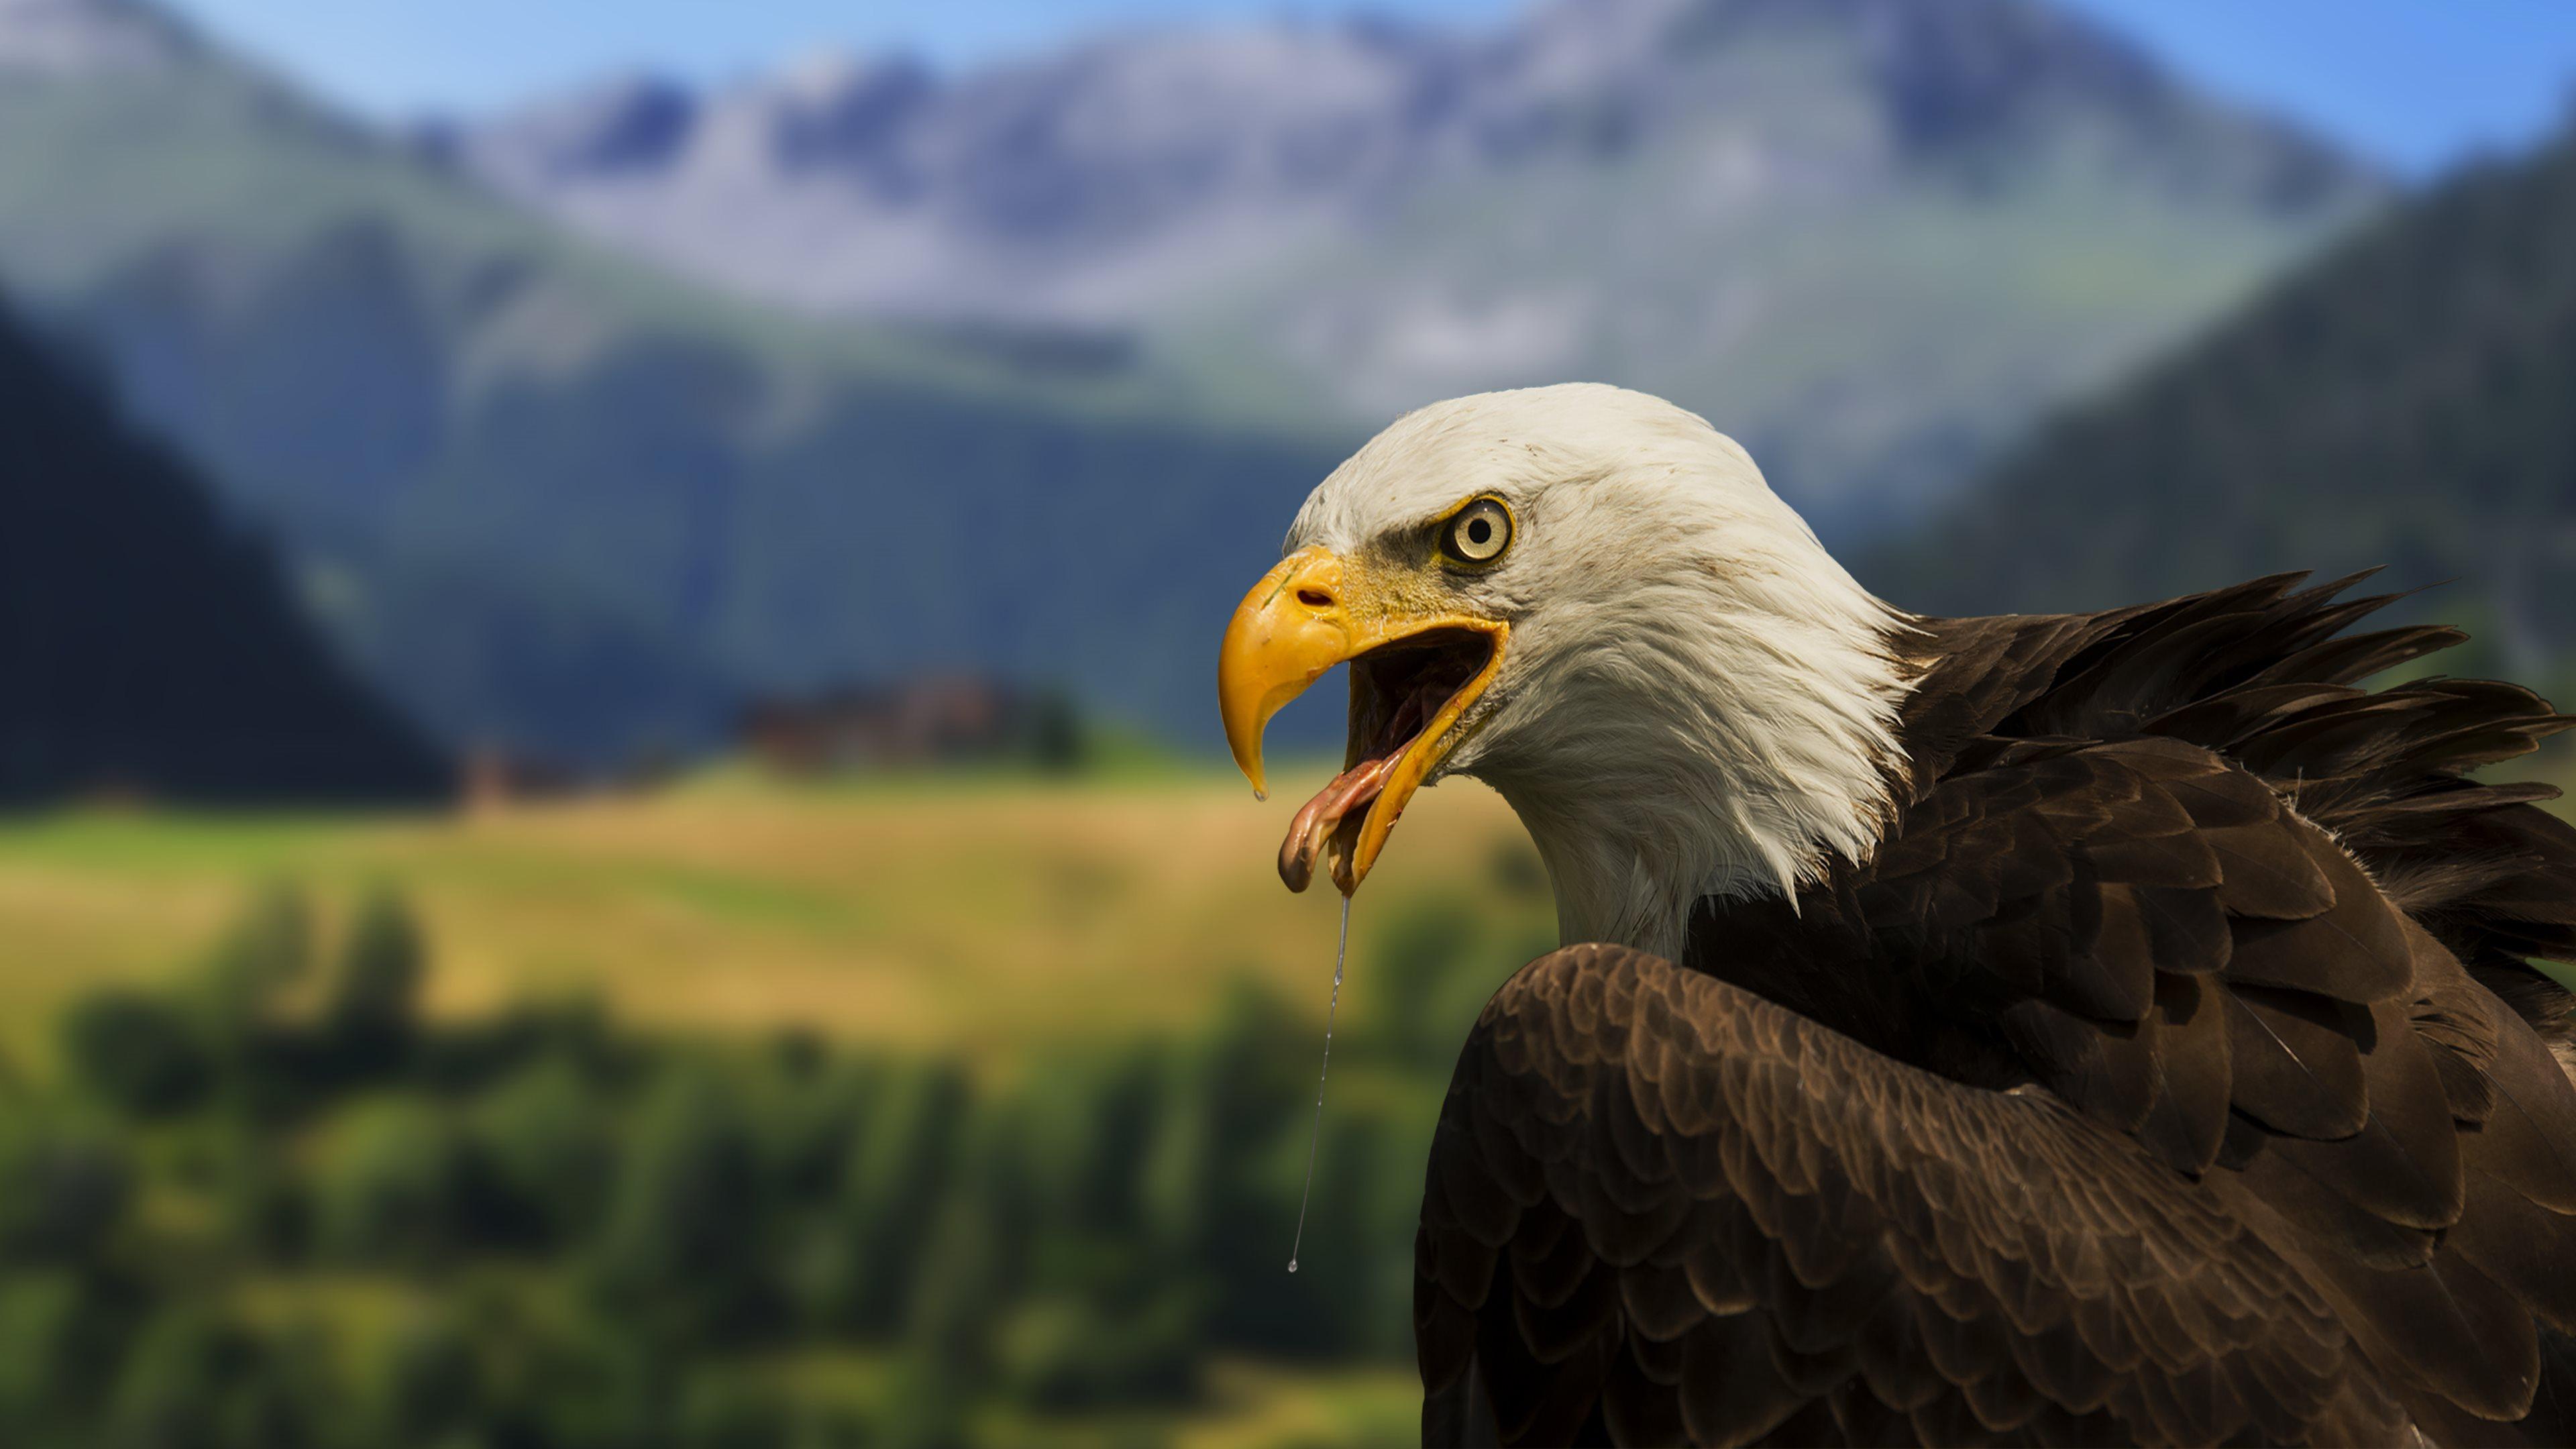 Free Download Bald Eagle 4k Wallpaper Full 1080p Ultra Hd